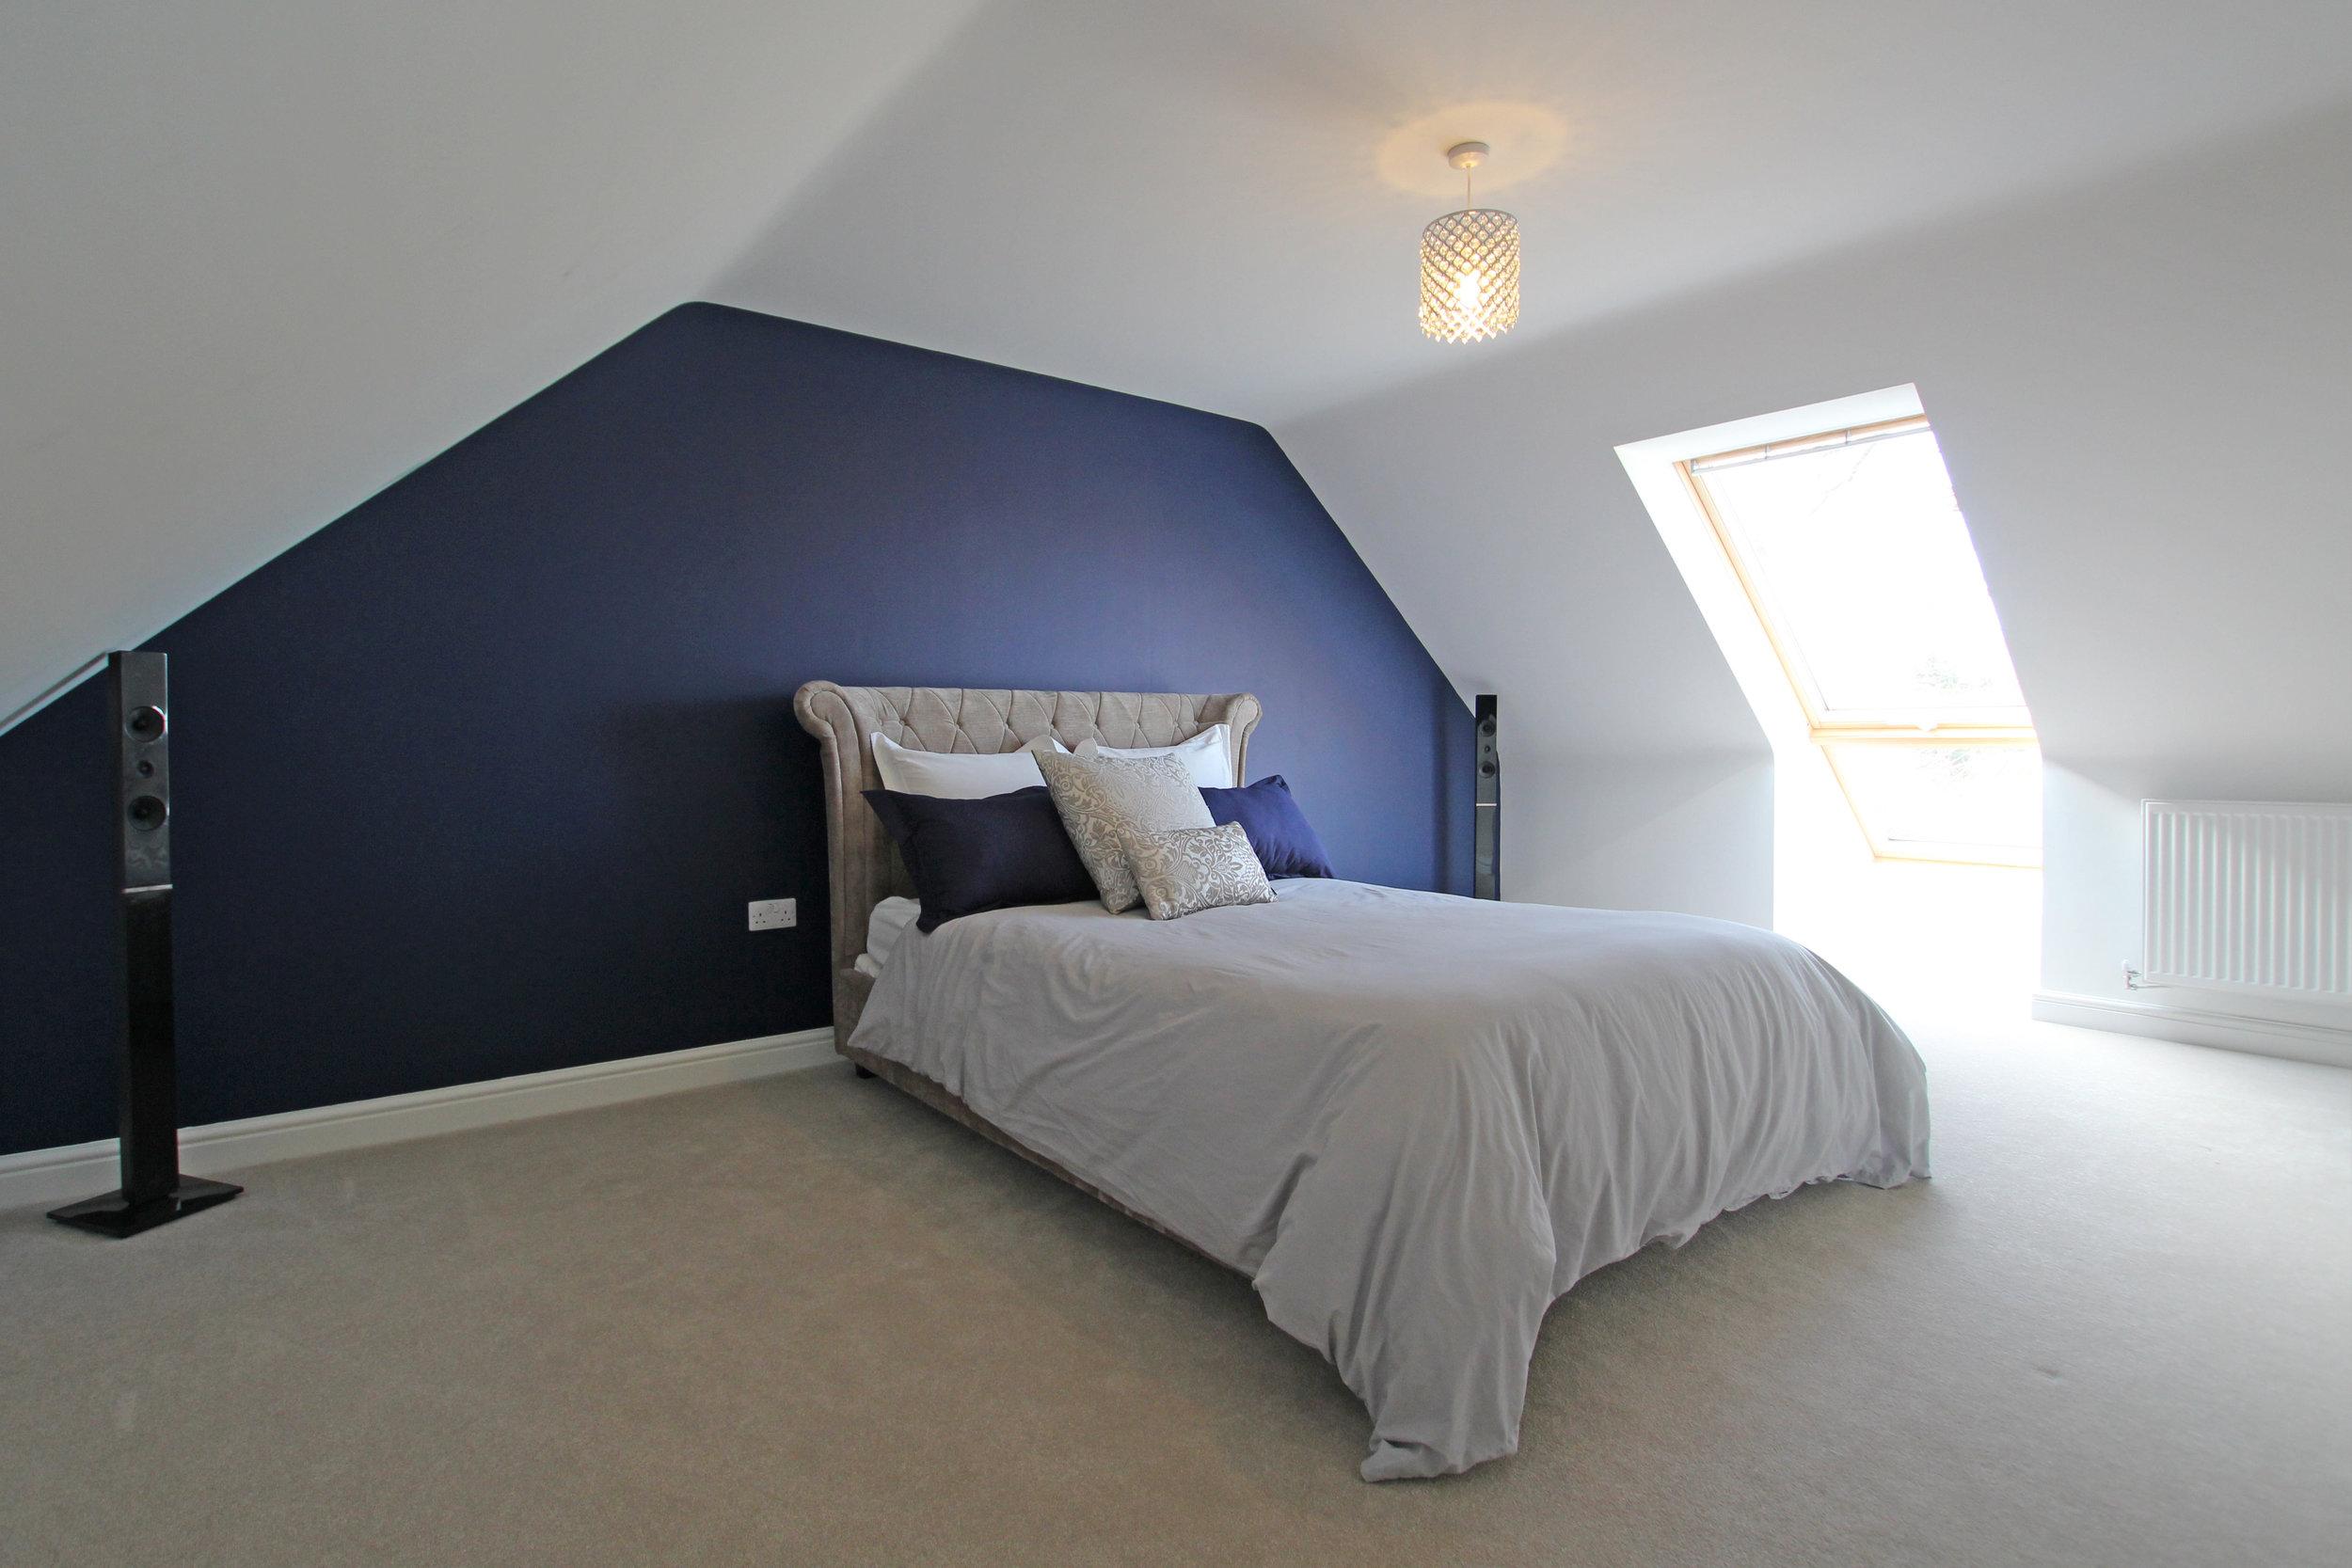 Bedroom-0005.jpg